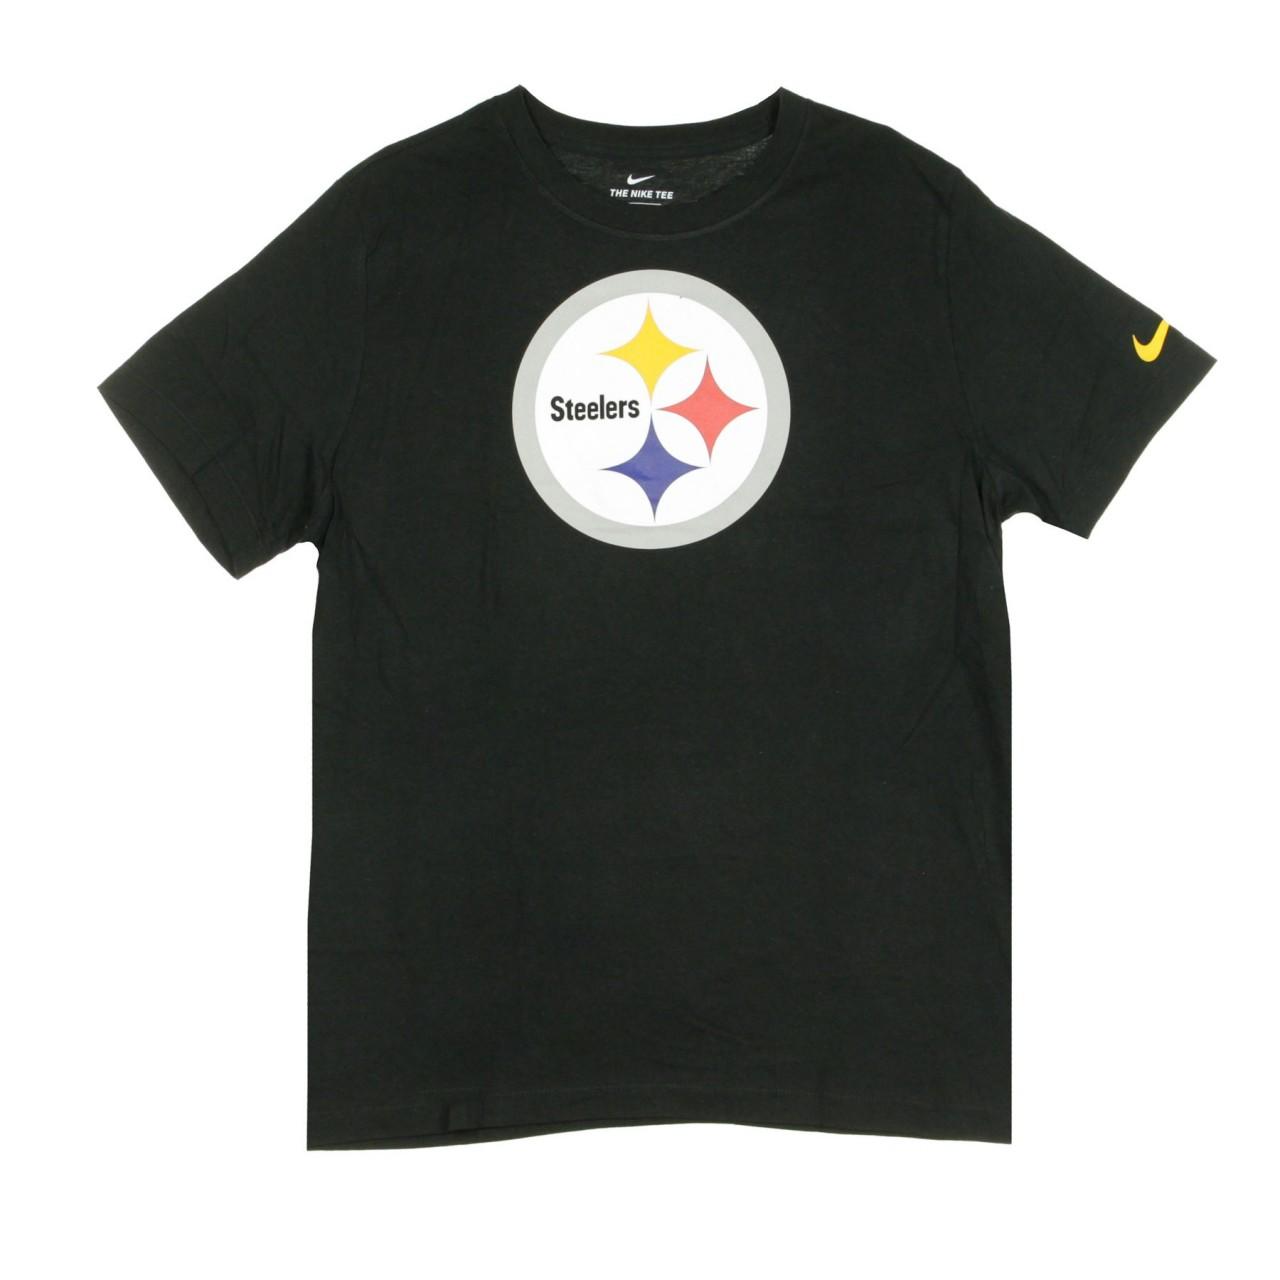 NIKE NFL NFL LOGO ESSENTIAL TEE PITSTE N199-00A-7L-CLH